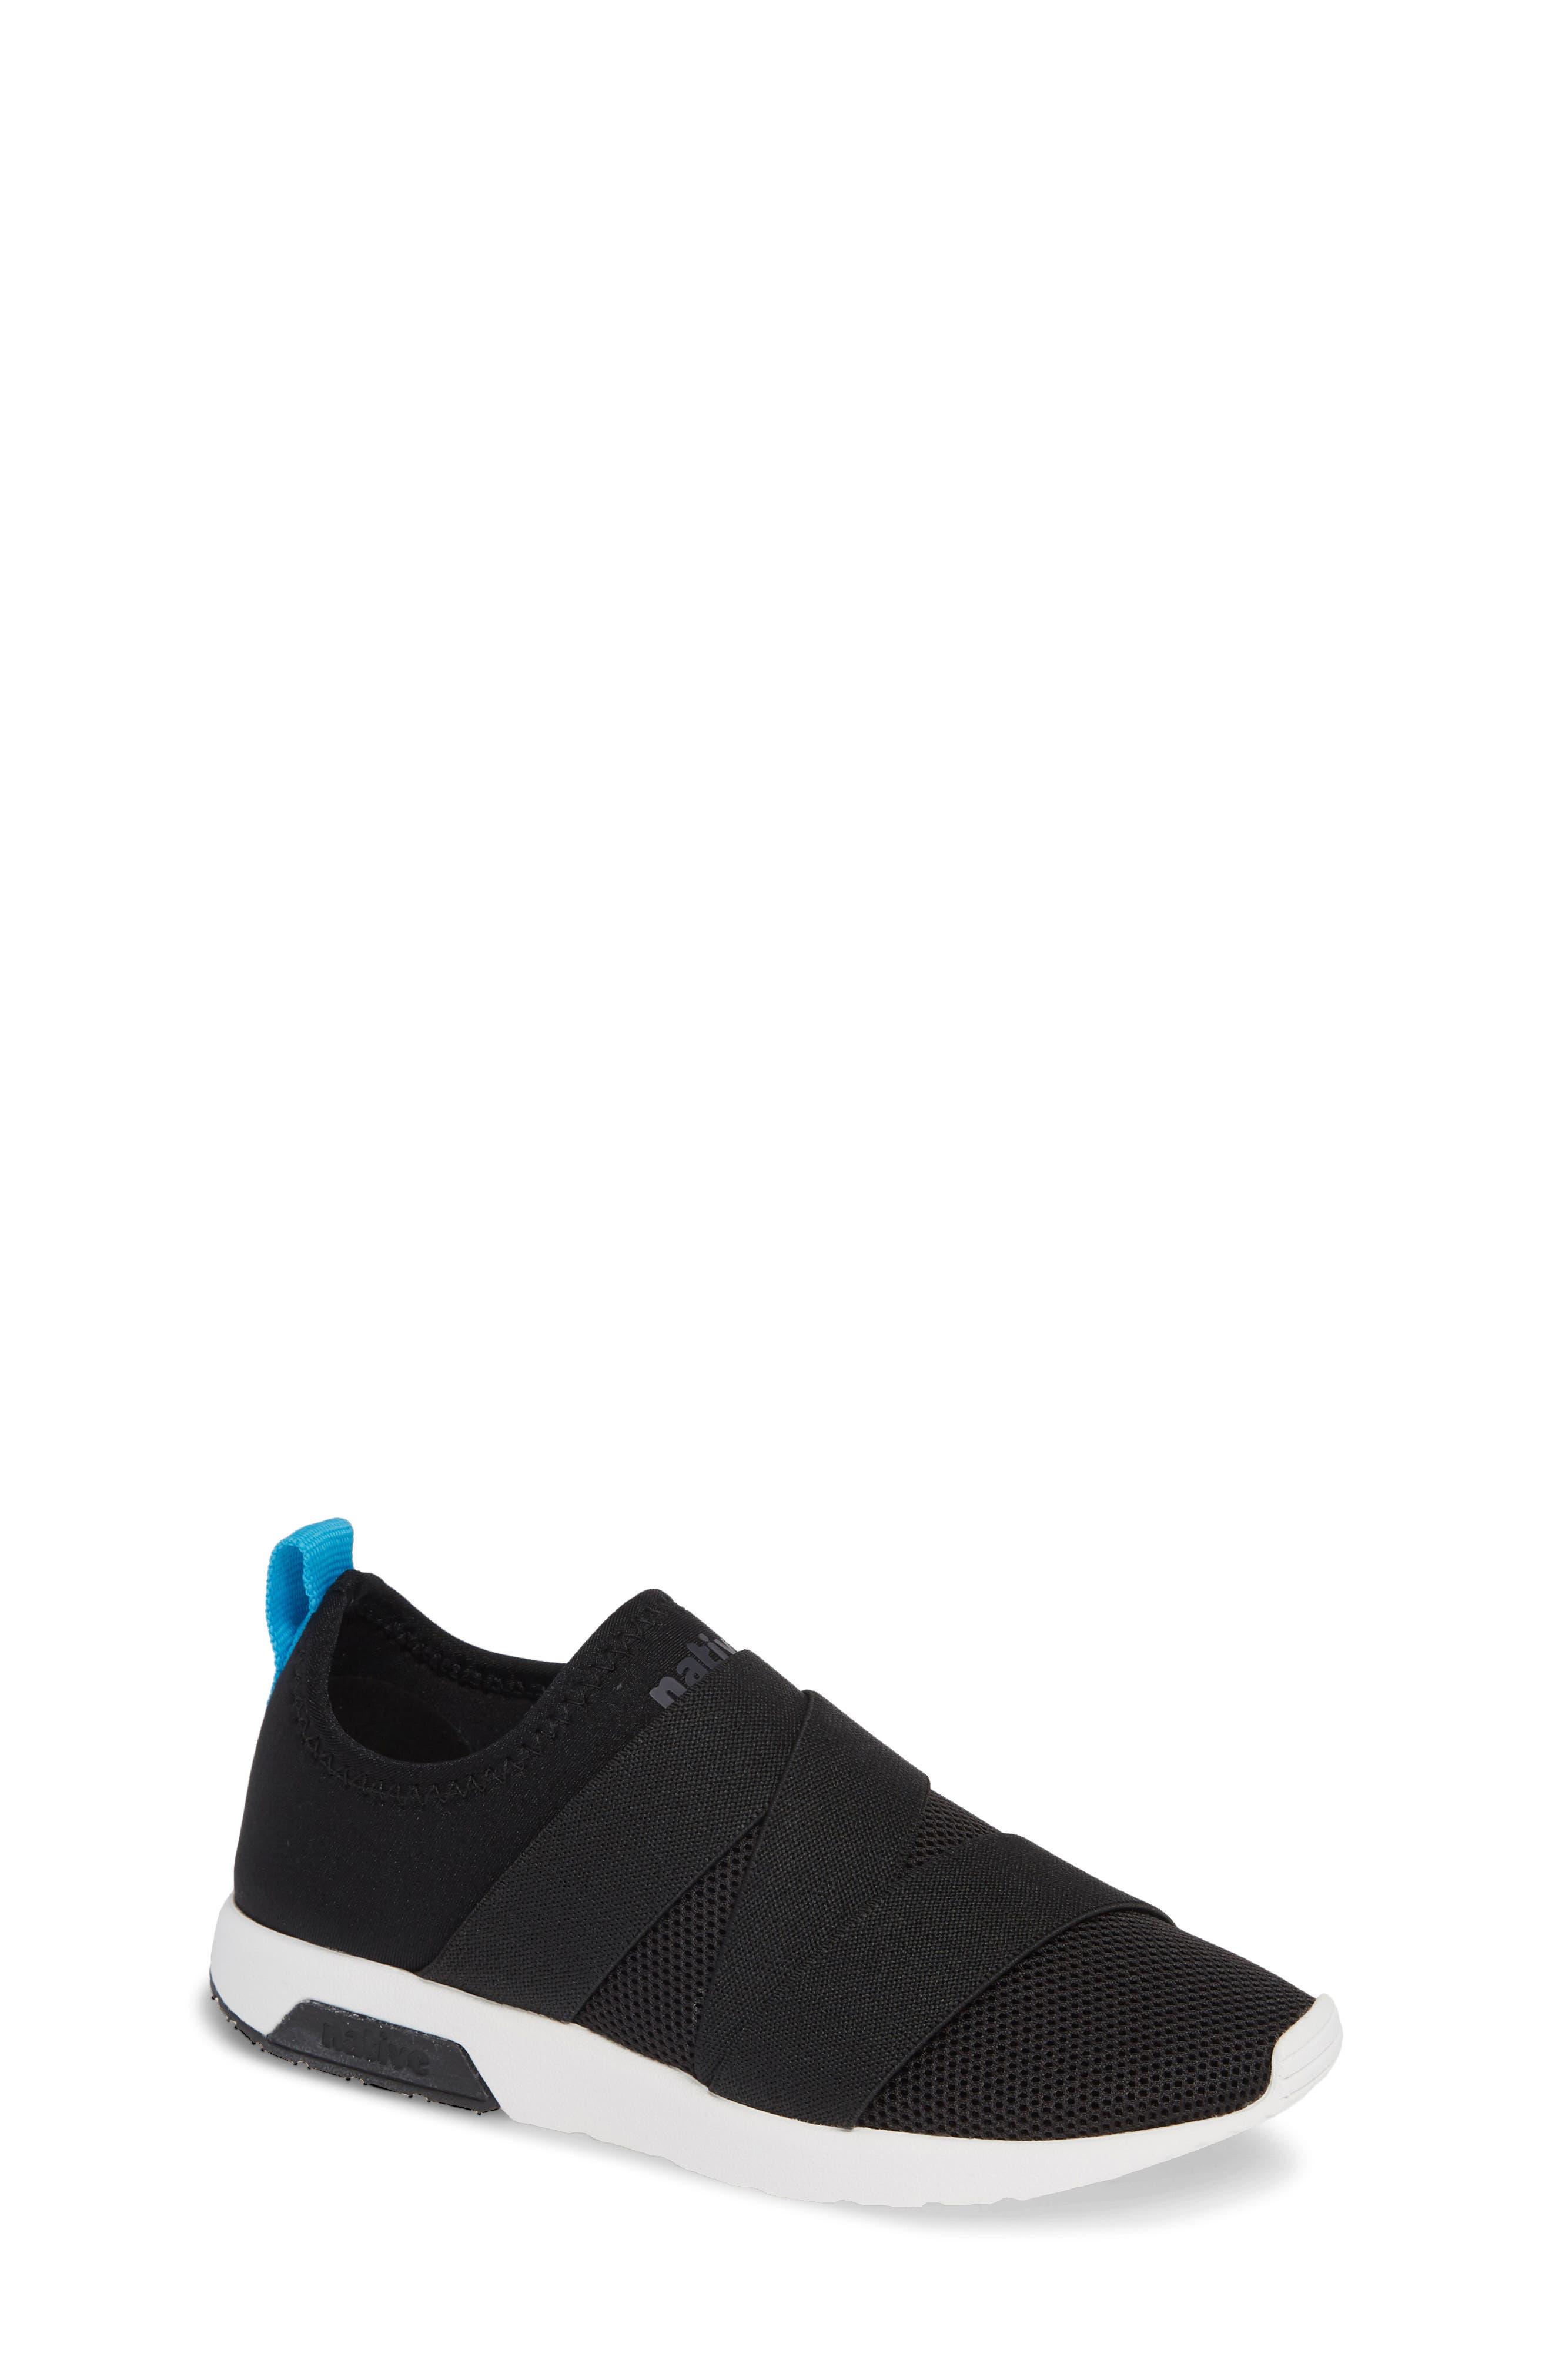 Phoenix Slip-On Sneaker,                             Main thumbnail 1, color,                             JIFFY BLACK/ SHELL WHITE